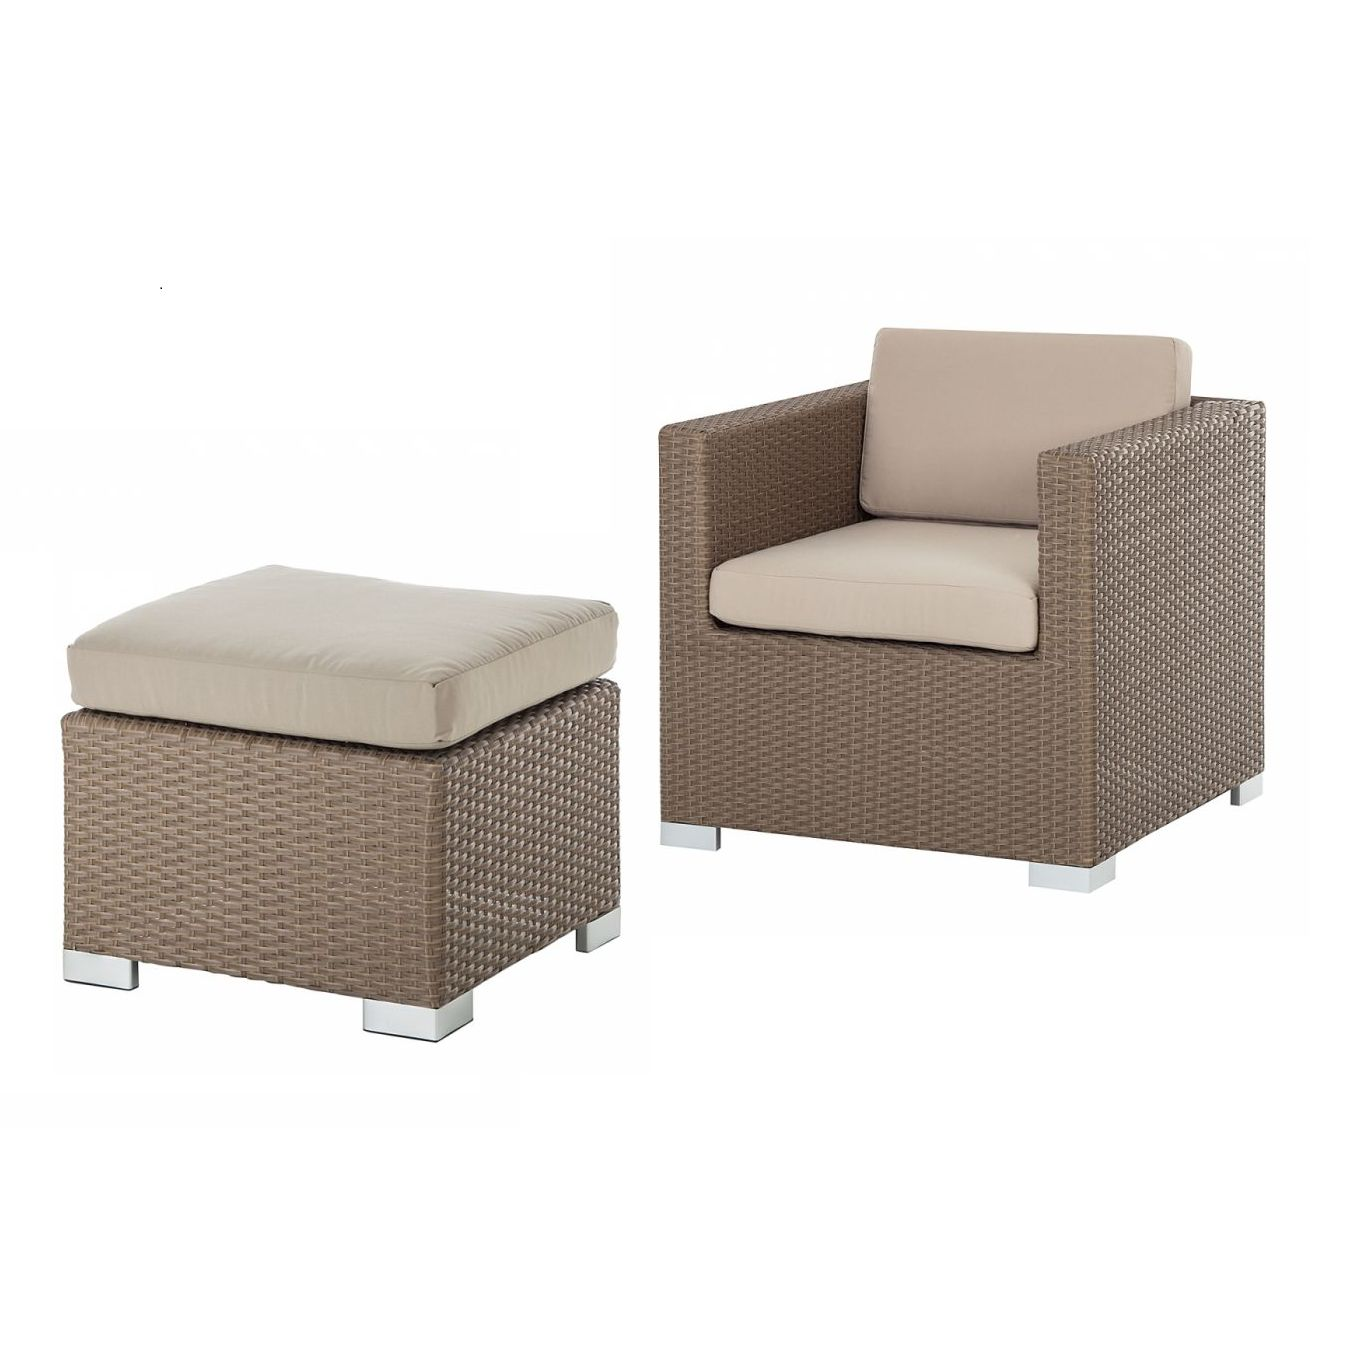 Sessel-Hocker-Set Rattanesco Puca (2-teilig) - Polyrattan/Textil - Braun/Beige, Kings Garden